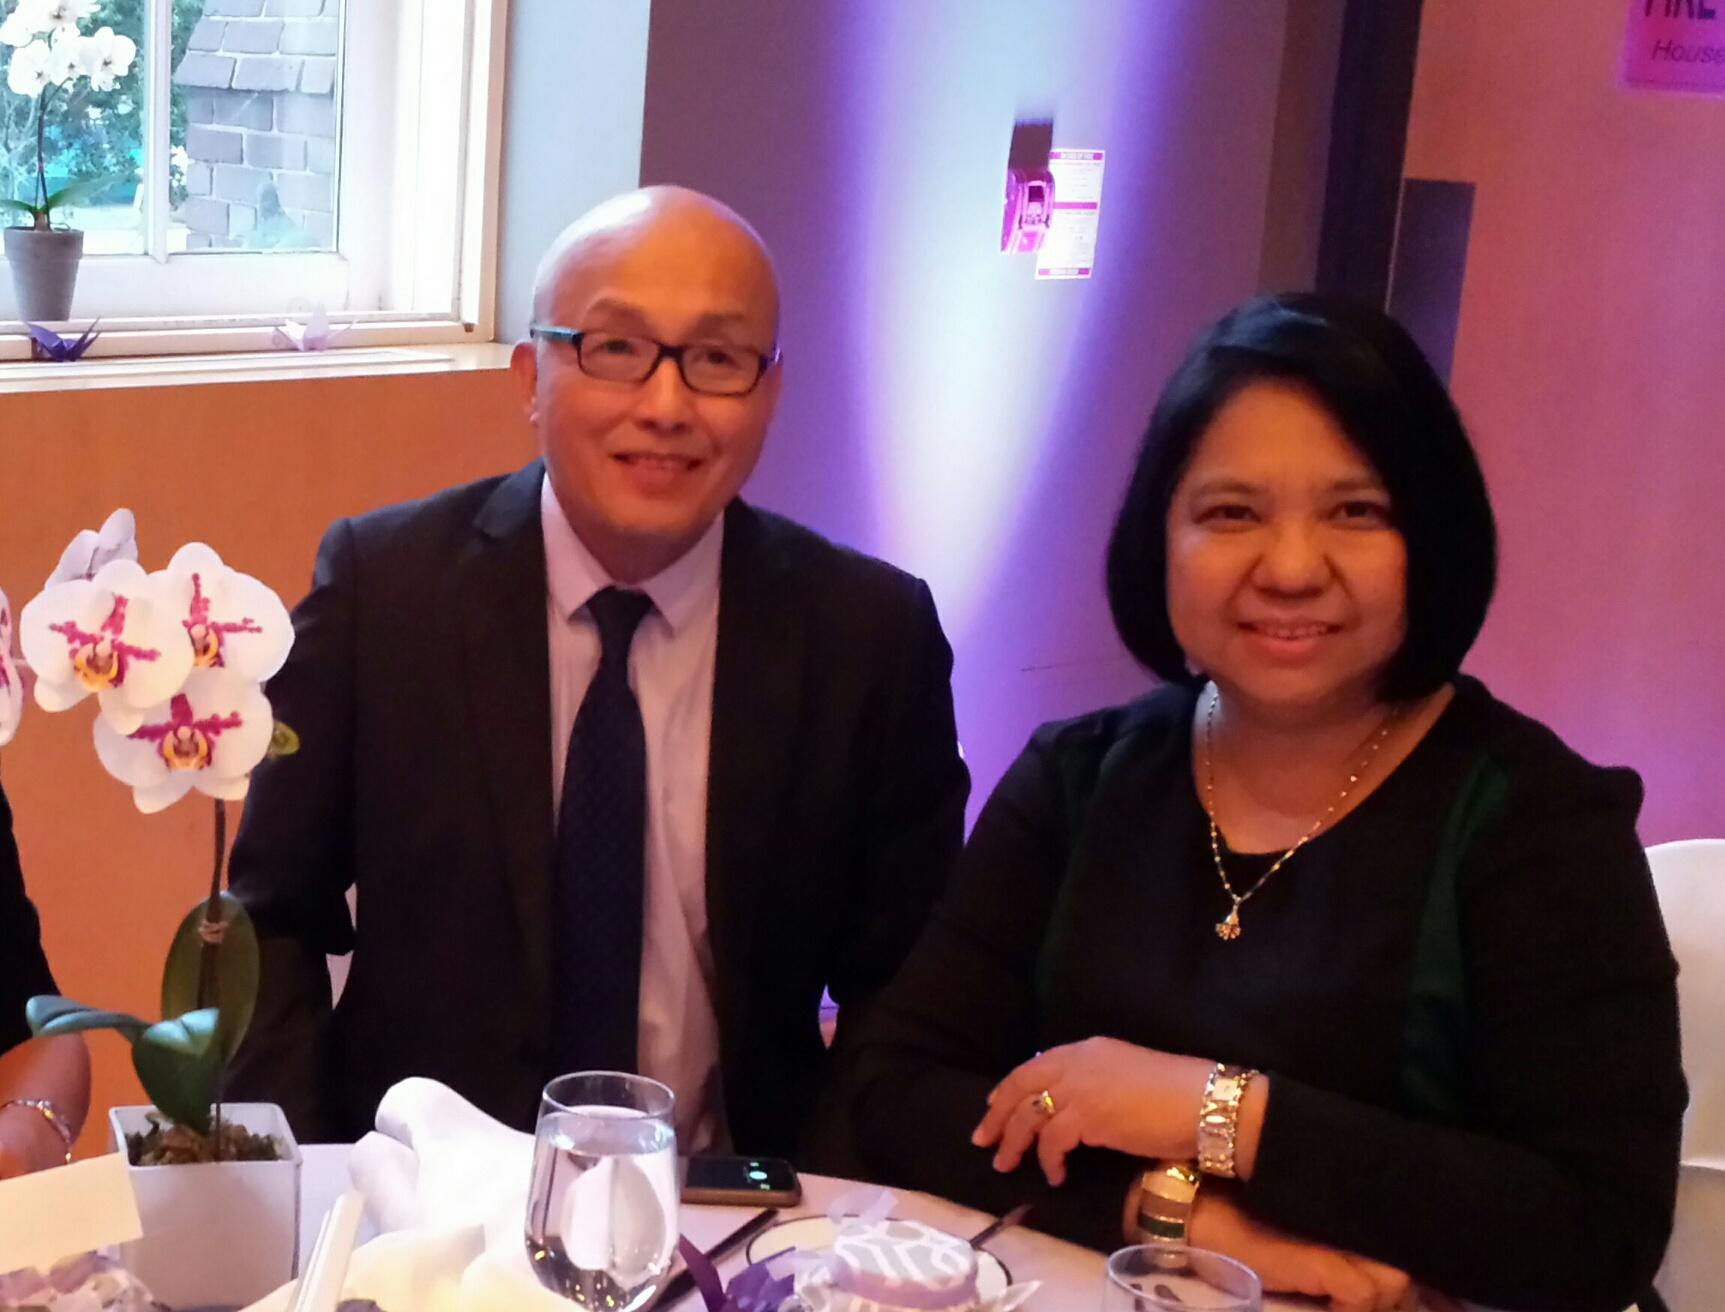 Husband and wife, Rowena and Virgilio Zamora